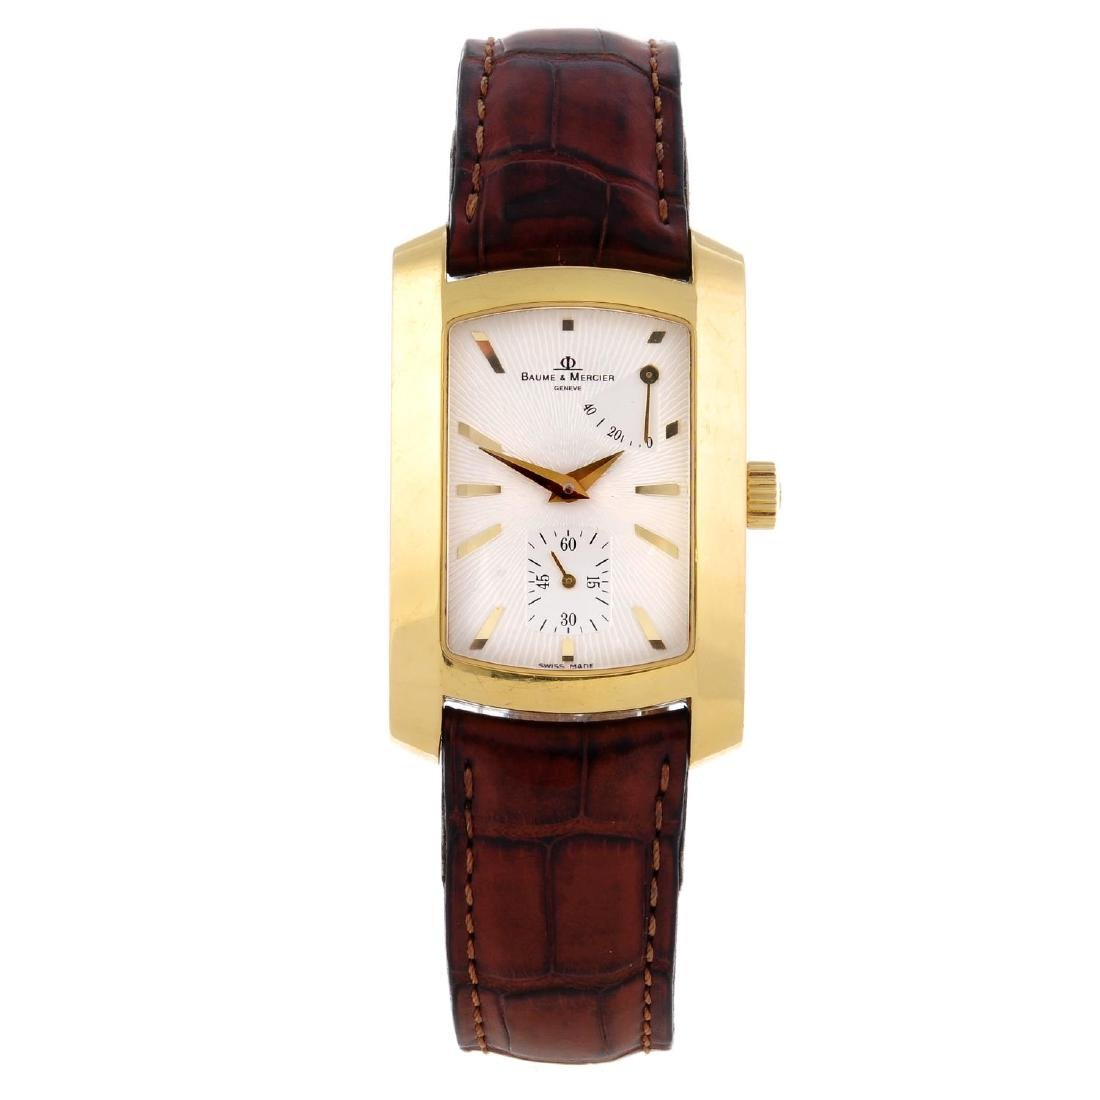 BAUME & MERCIER - a gentleman's Hampton Milleis wrist